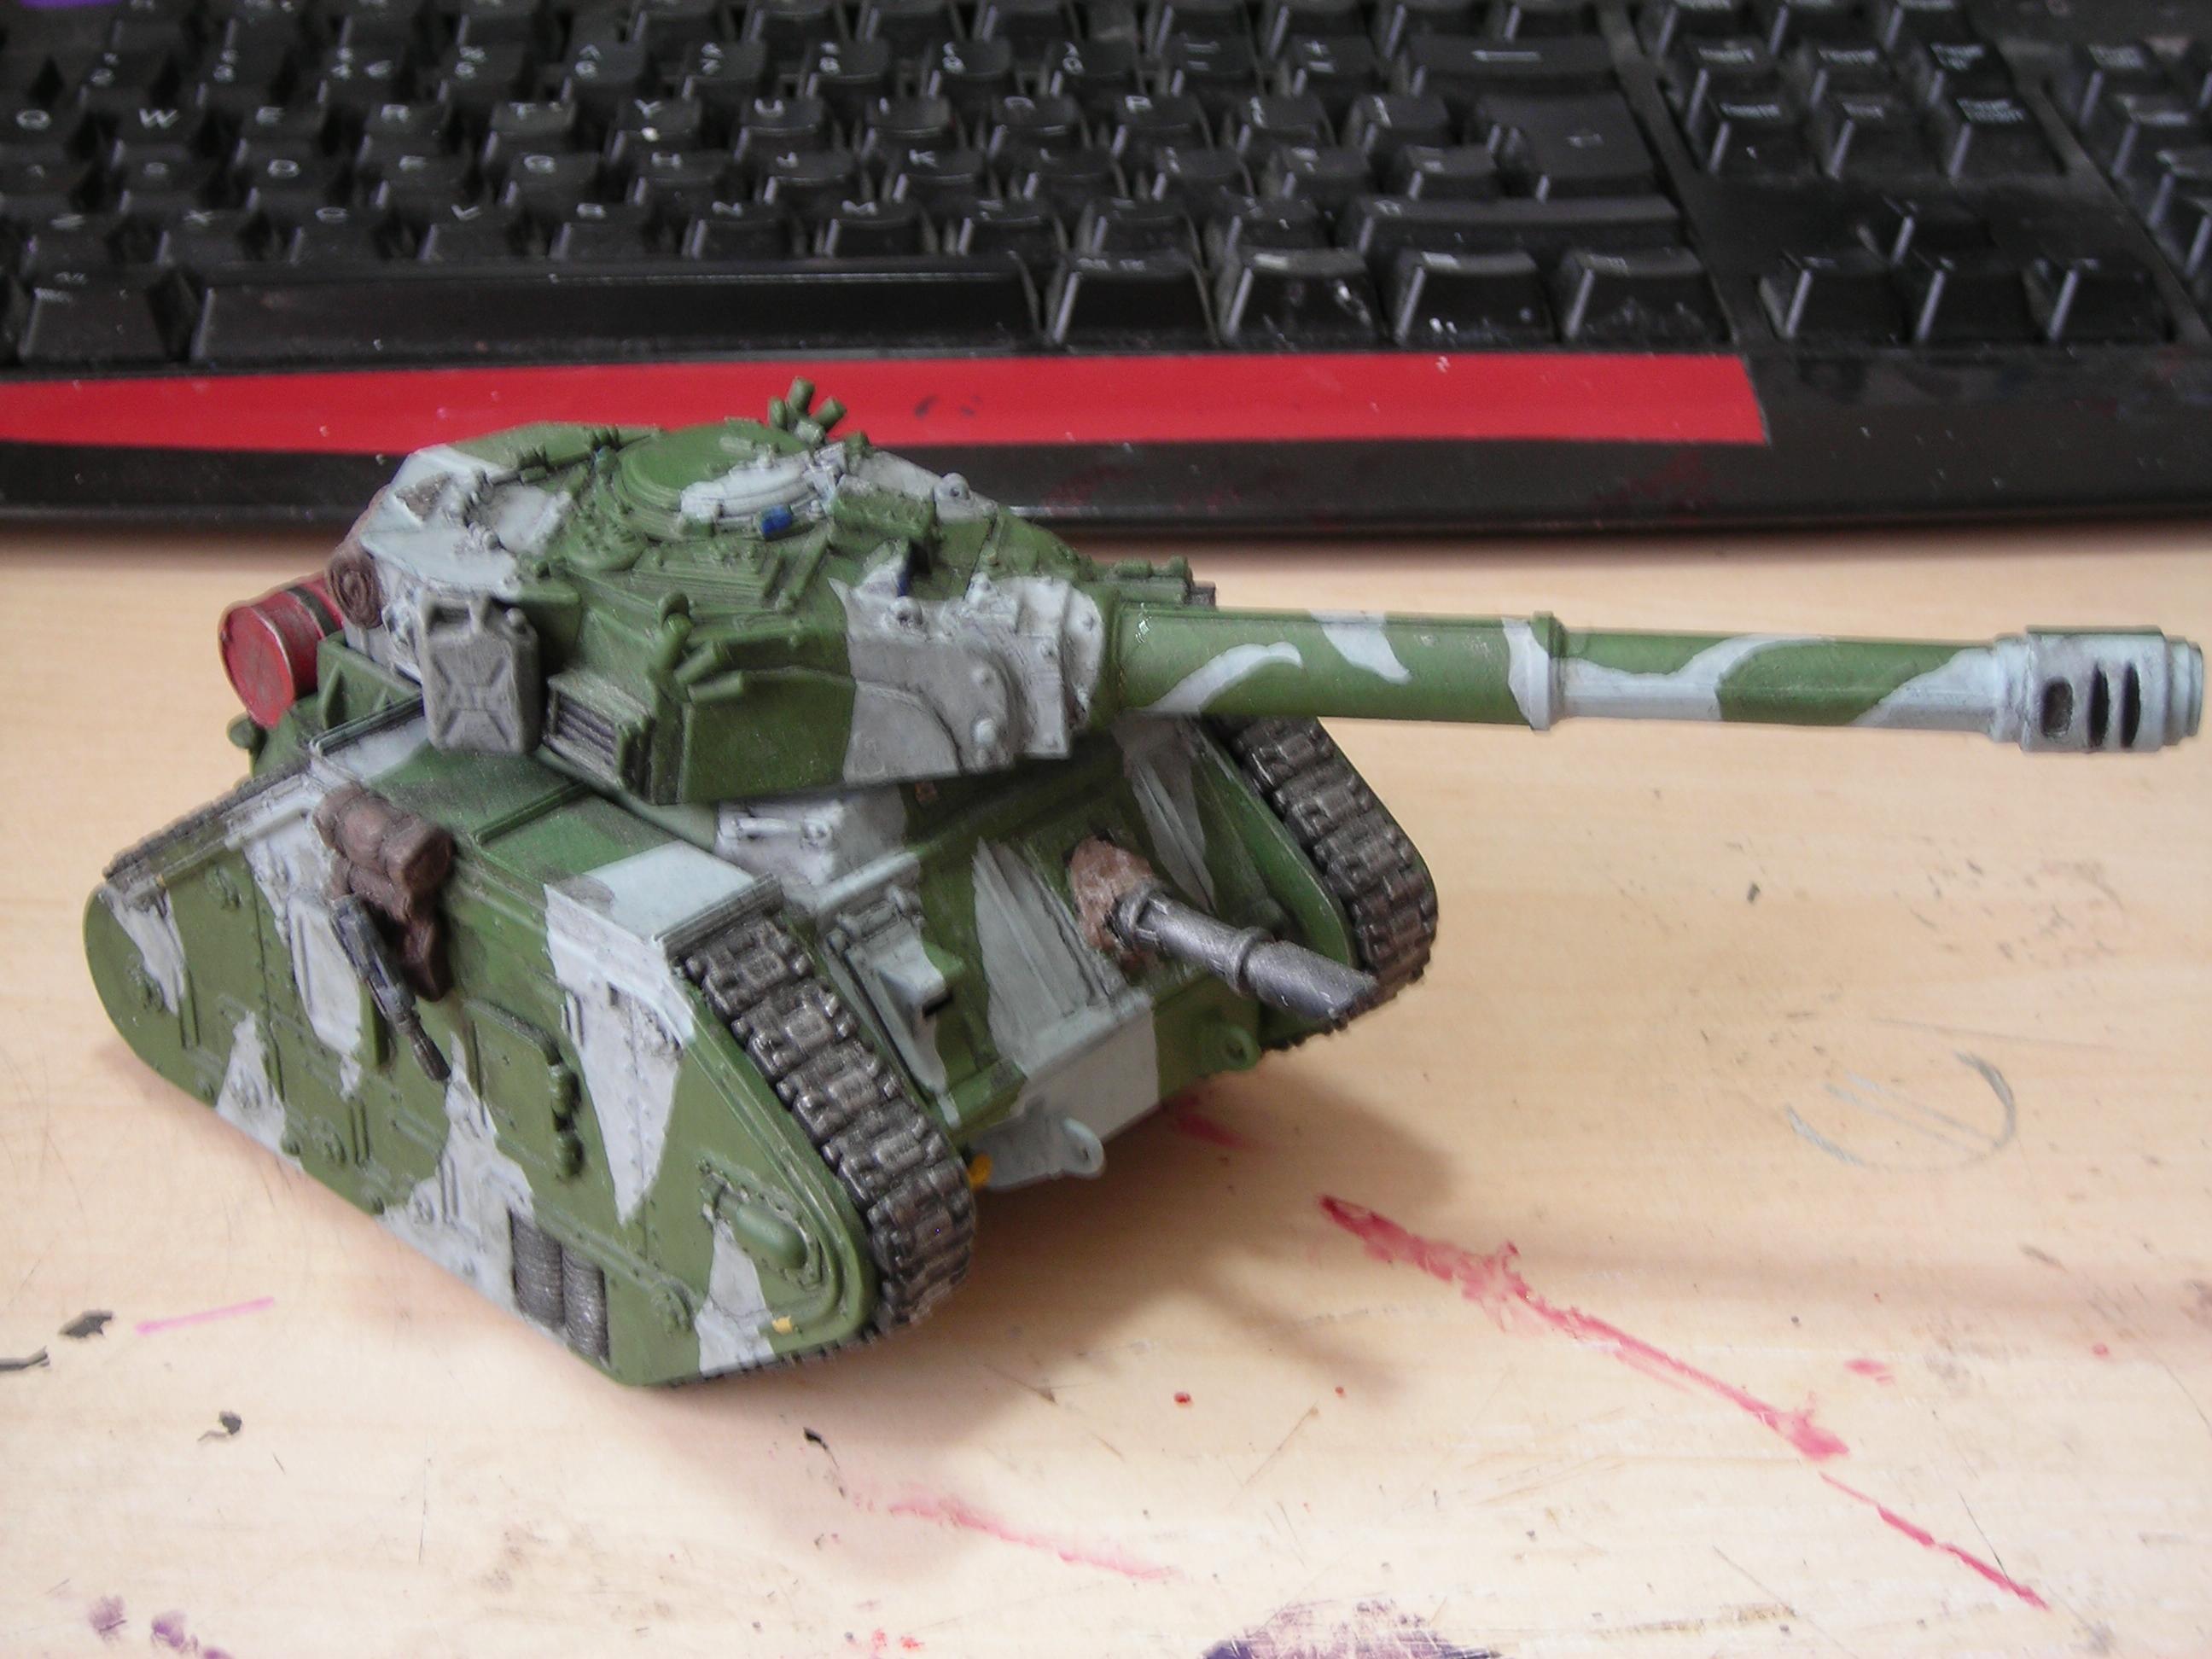 Astra Militarum, Imperial Guard, Leman Russ, Tank, Tank Destroyer, Vanquisher